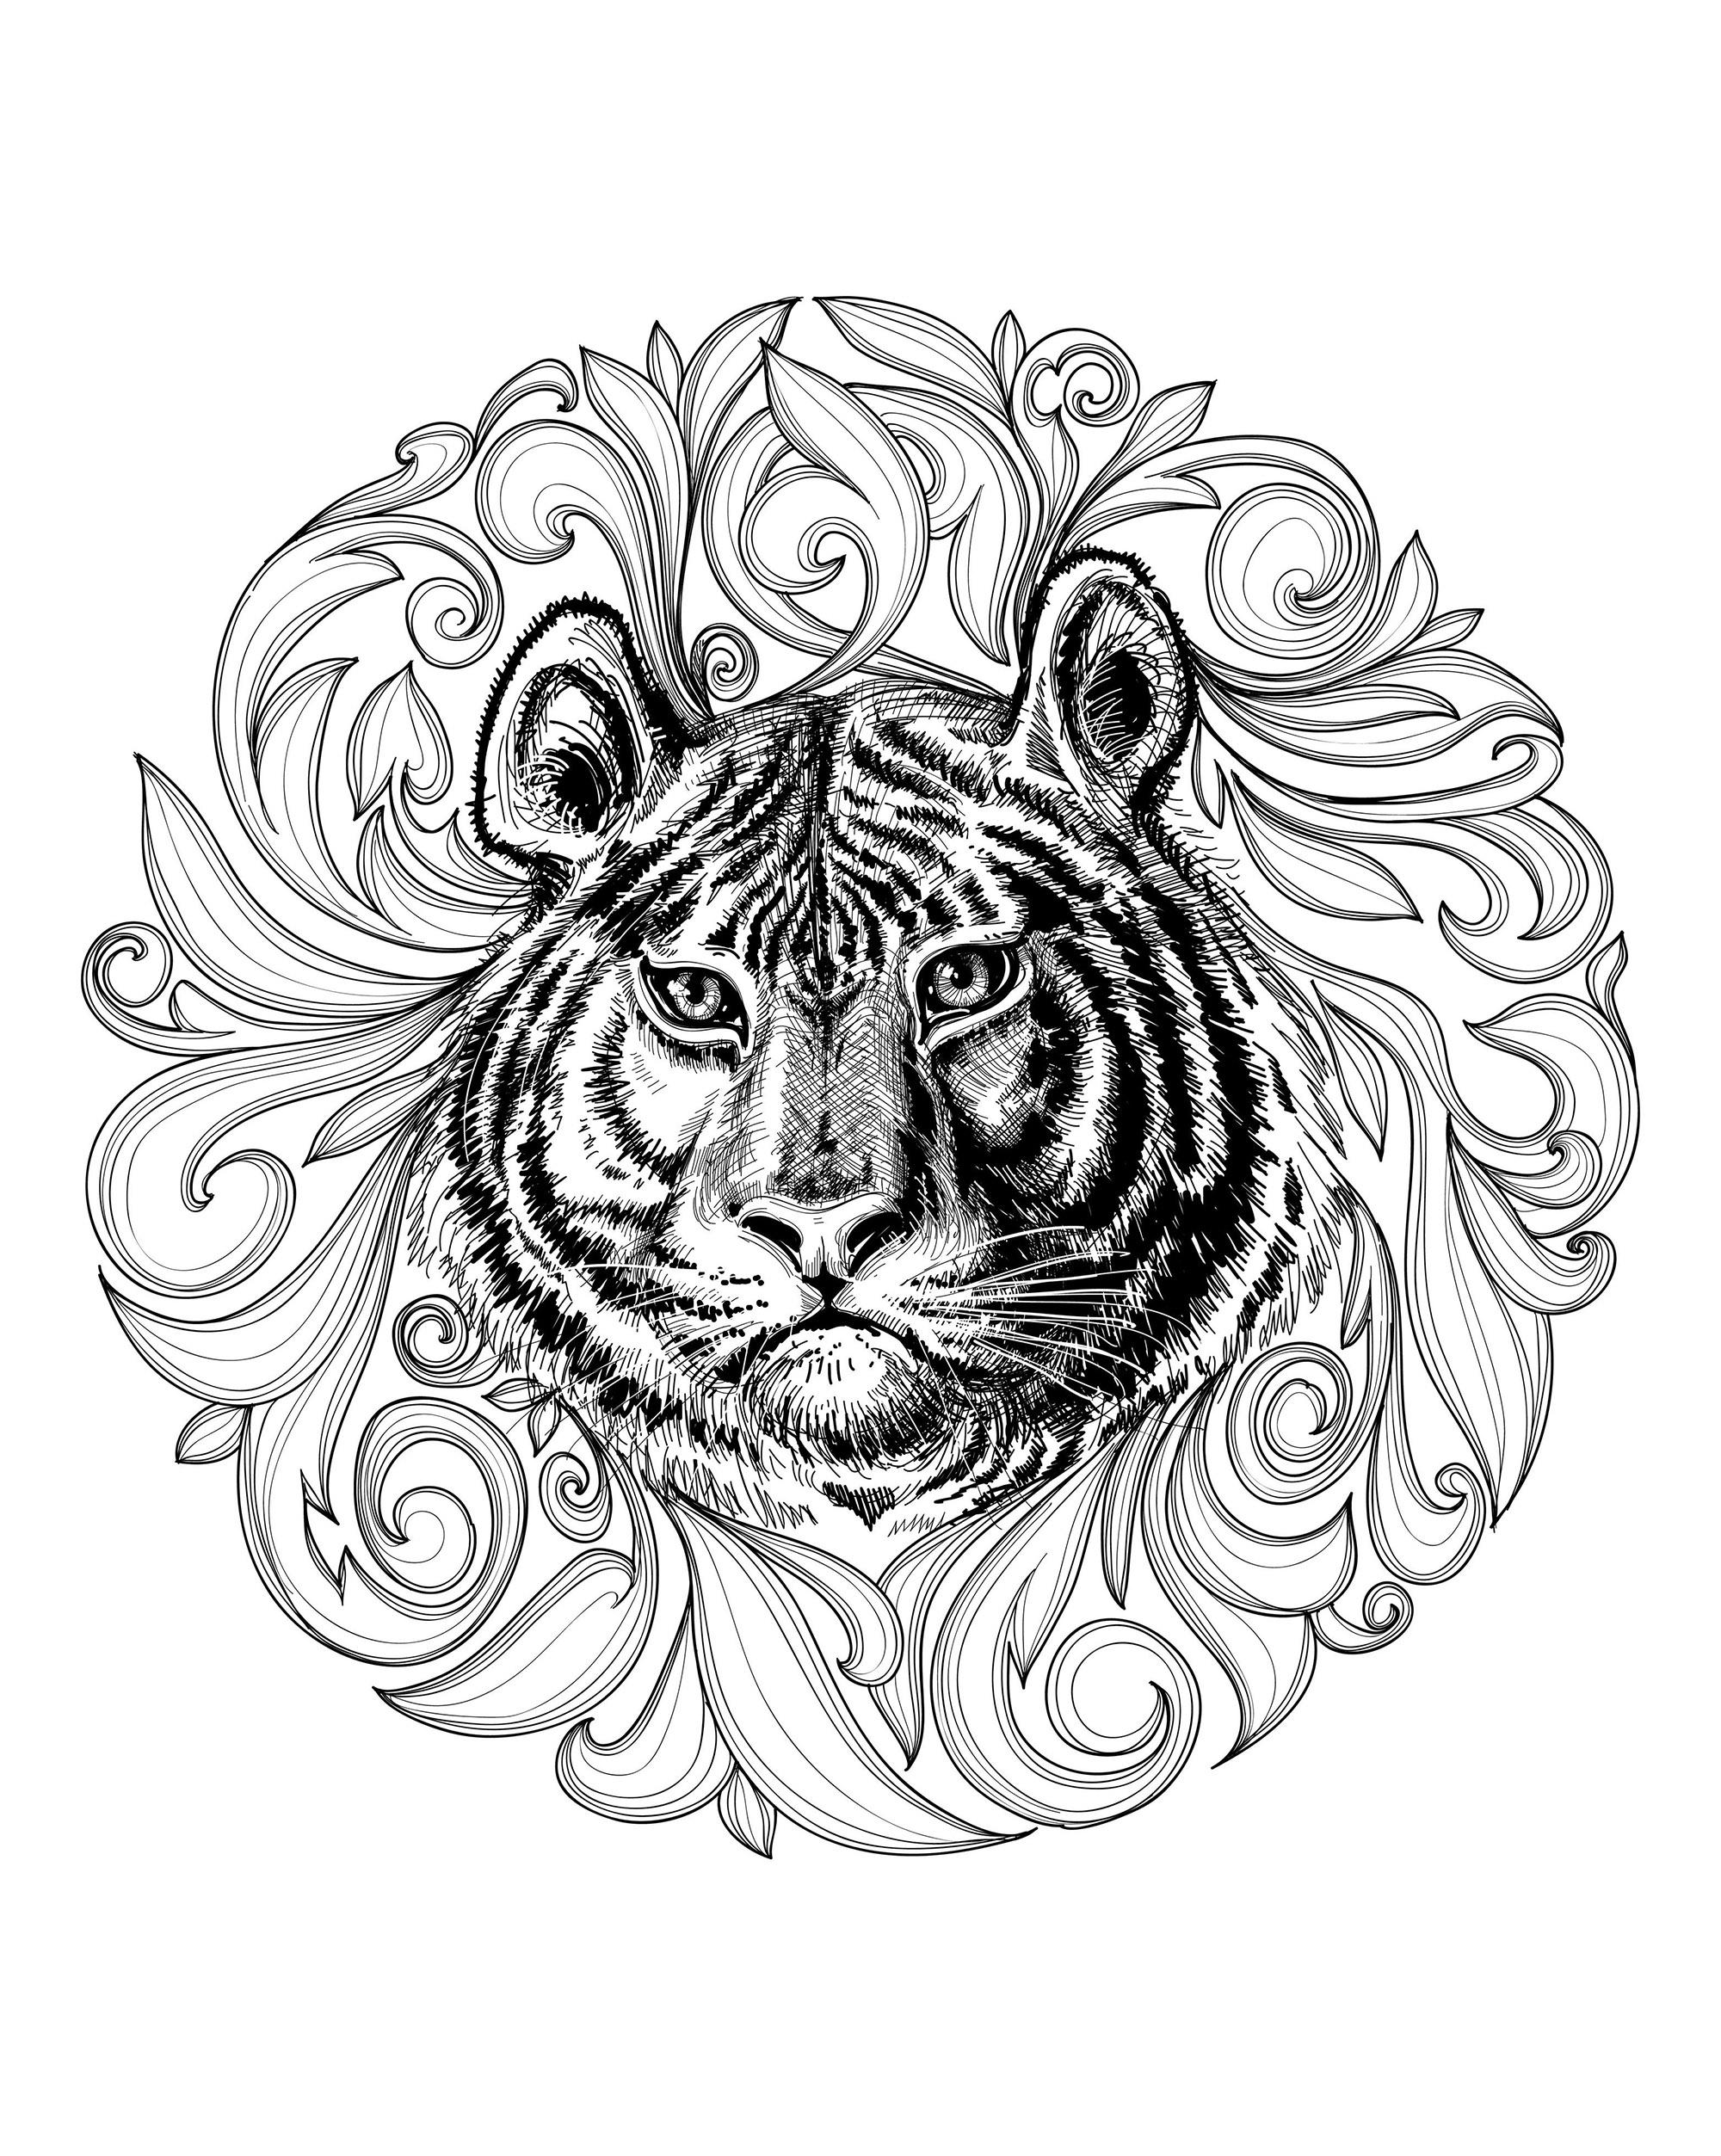 Coloriage Tigre.Tigre Cadre Feuillu Tigres Coloriages Difficiles Pour Adultes